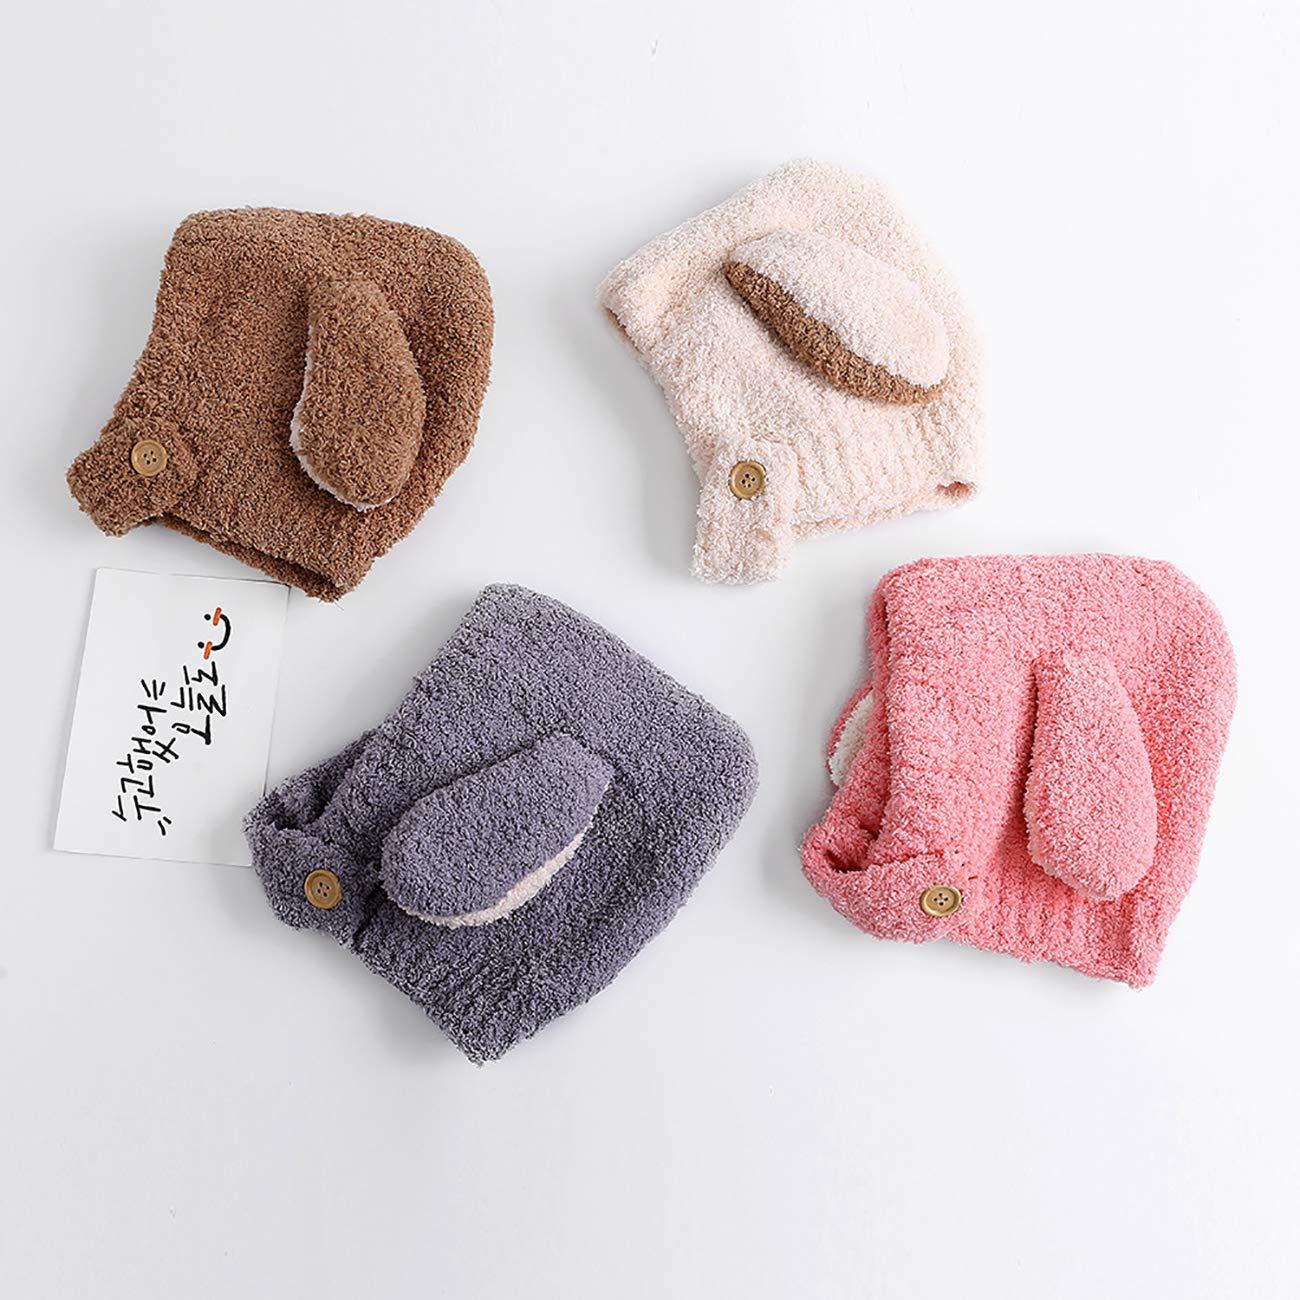 Uheng Baby Kids Girls Boys Winter Soft Warm Hats Infant Toddler Children Beanie Cap Earflap Hat